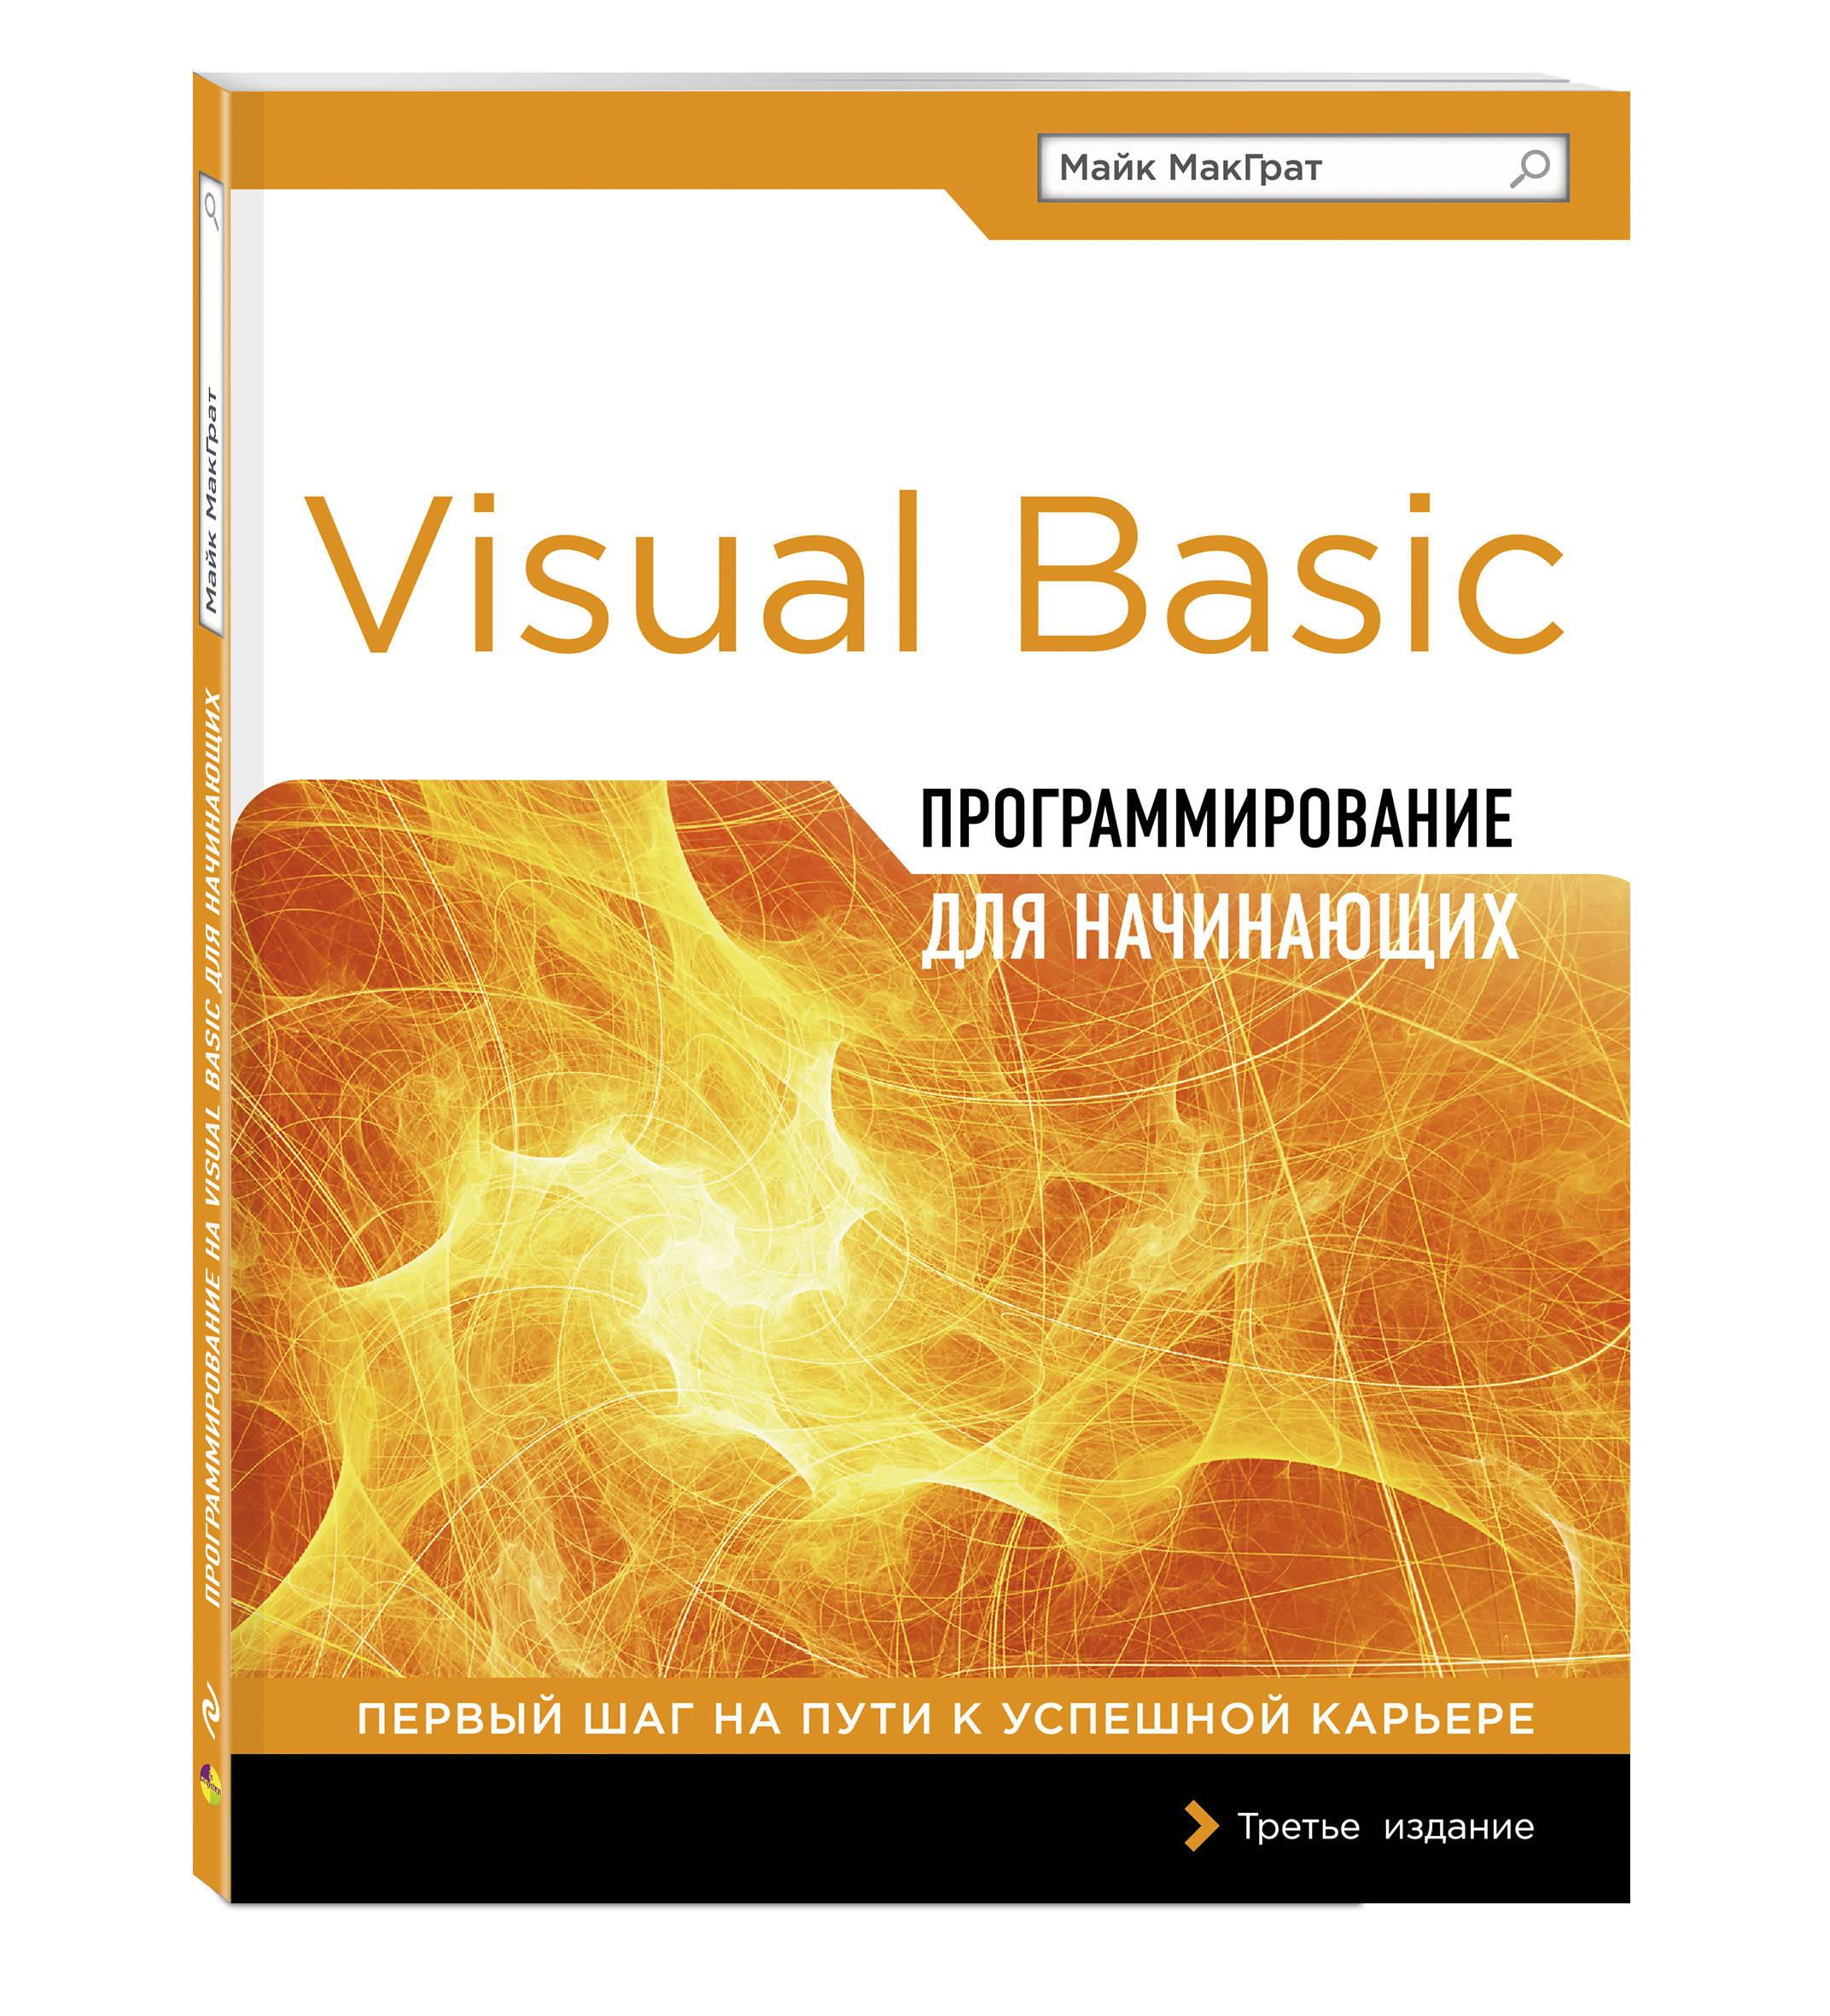 Майк МакГрат Программирование на Visual Basic для начинающих макграт м visual basic